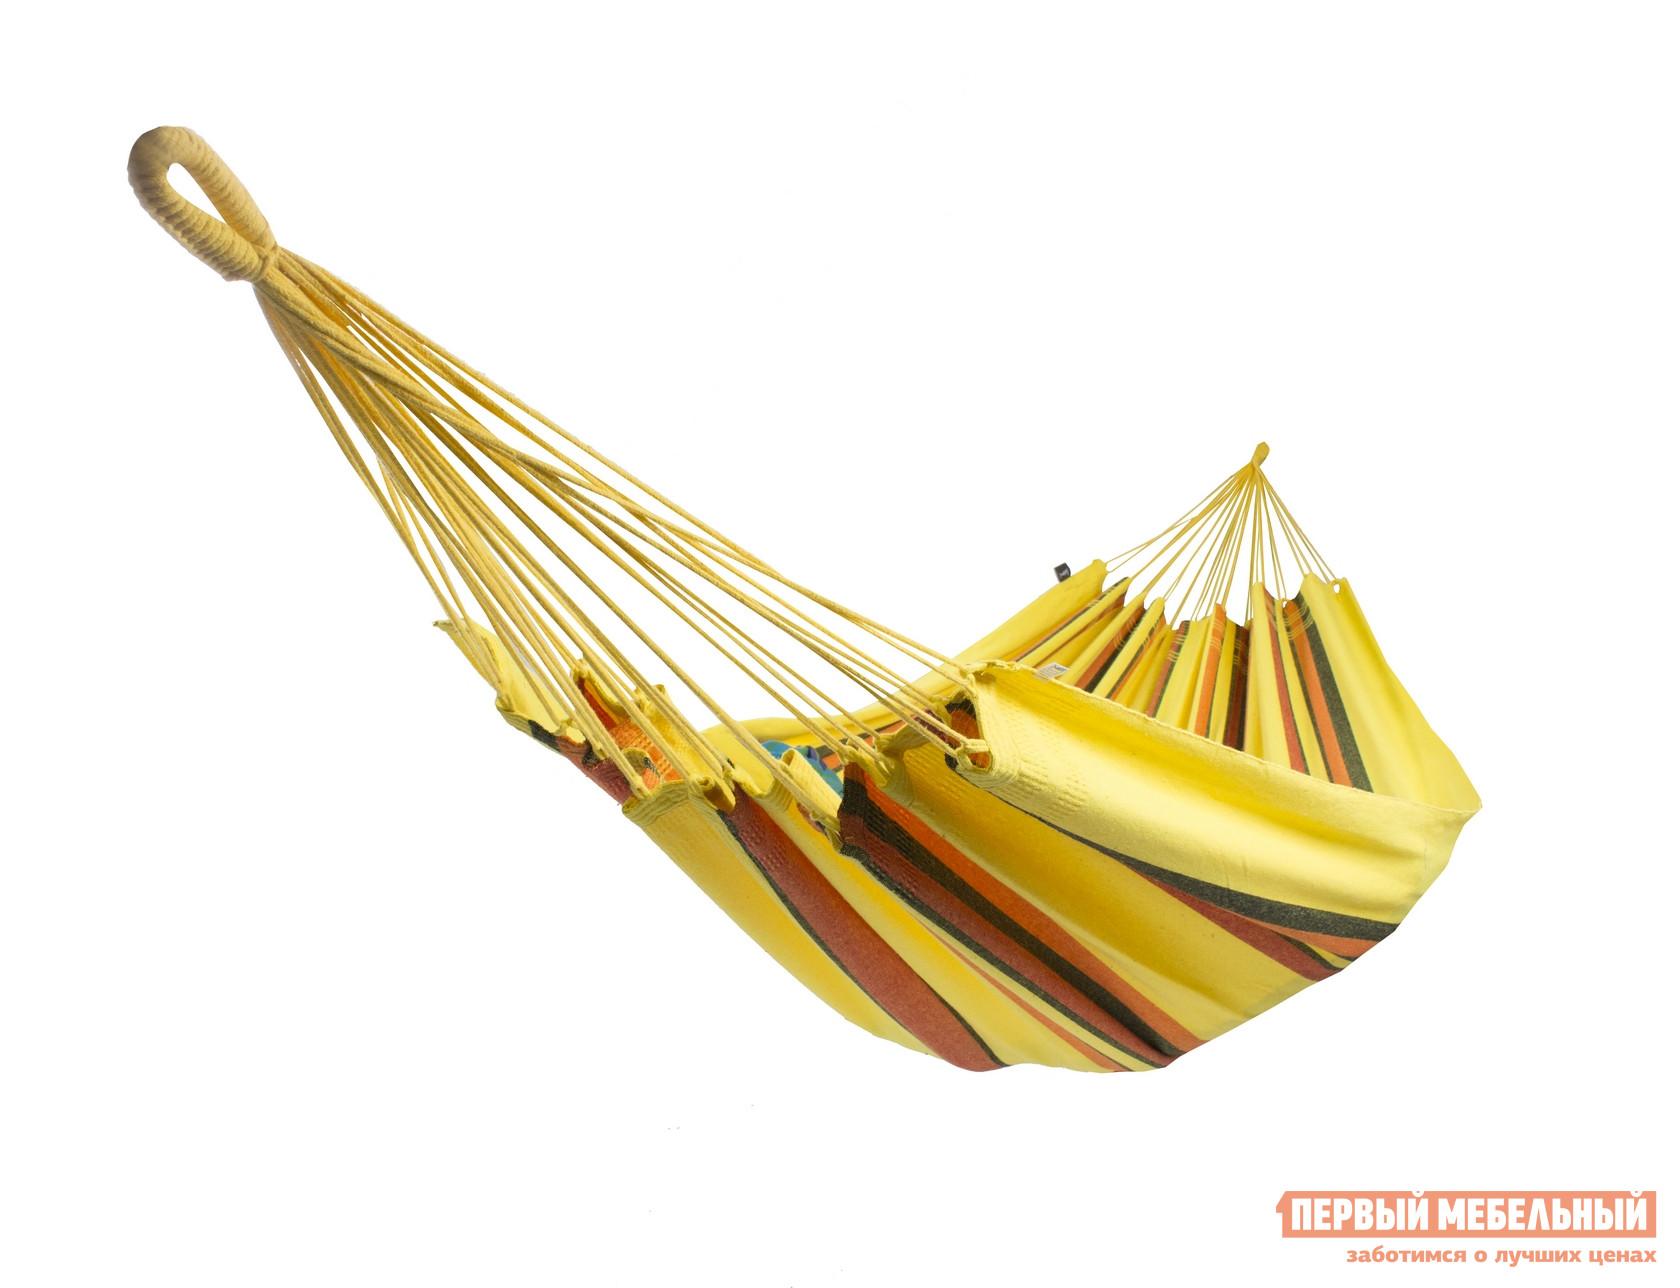 Гамак Мебель Импэкс MILLI SUN (BHD-02) гамак дачная мебель гамак тканый